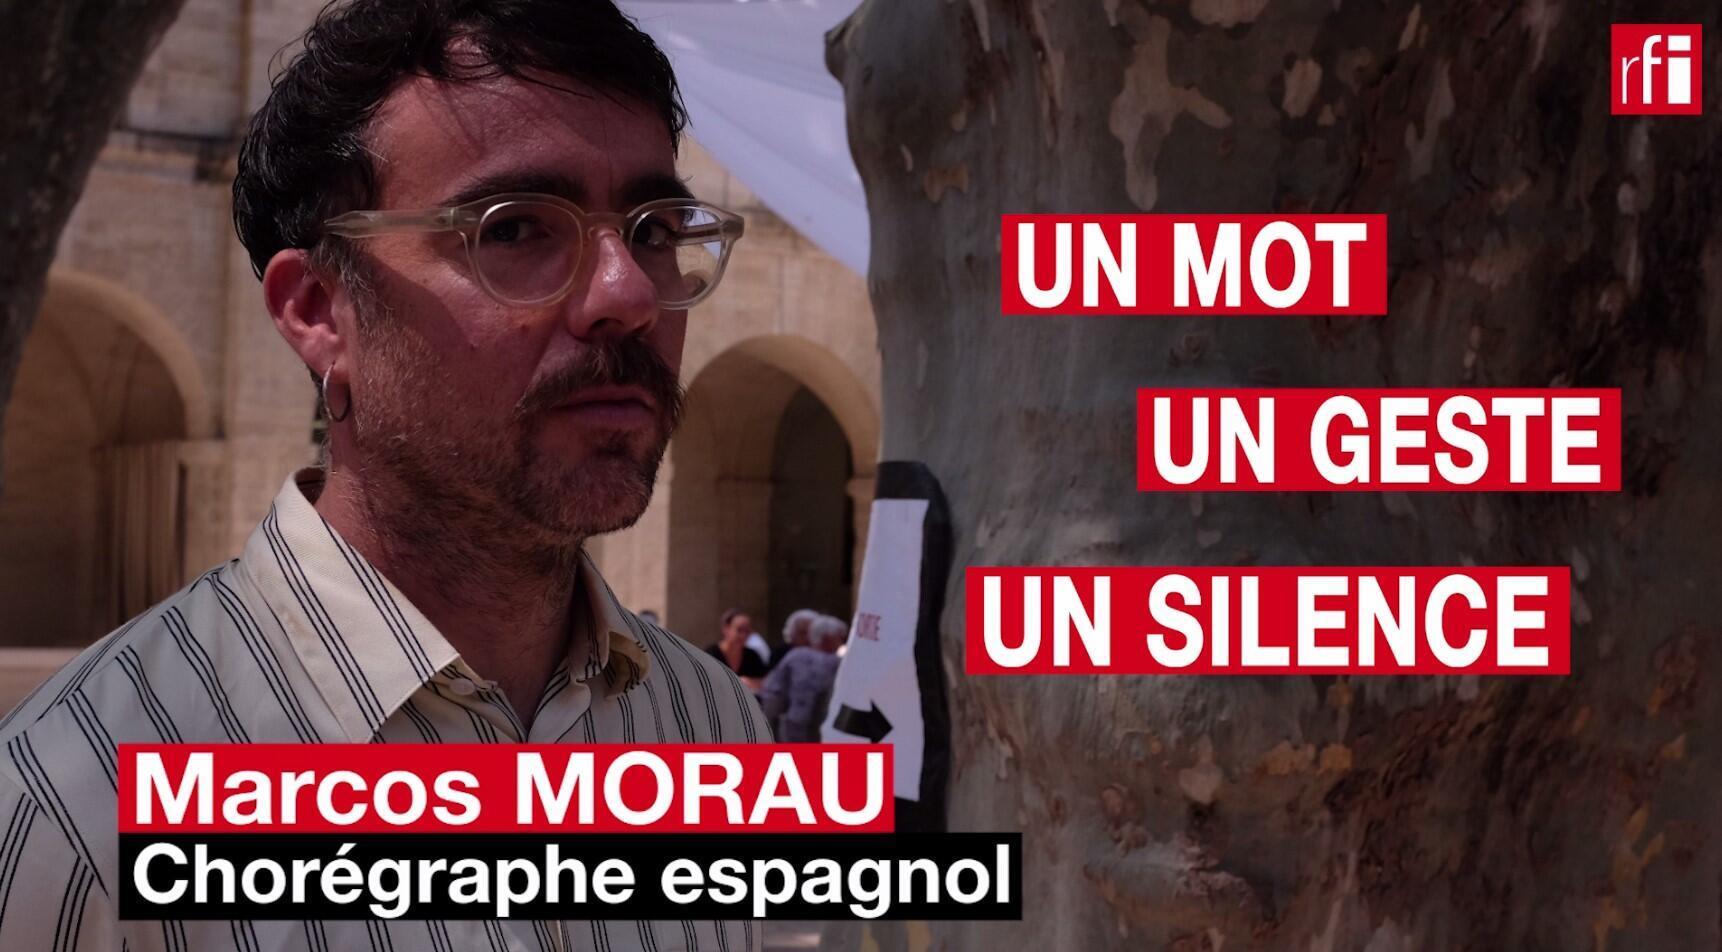 Marcos Morau, chorégraphe de « Sonoma », en un mot, un geste et un silence.